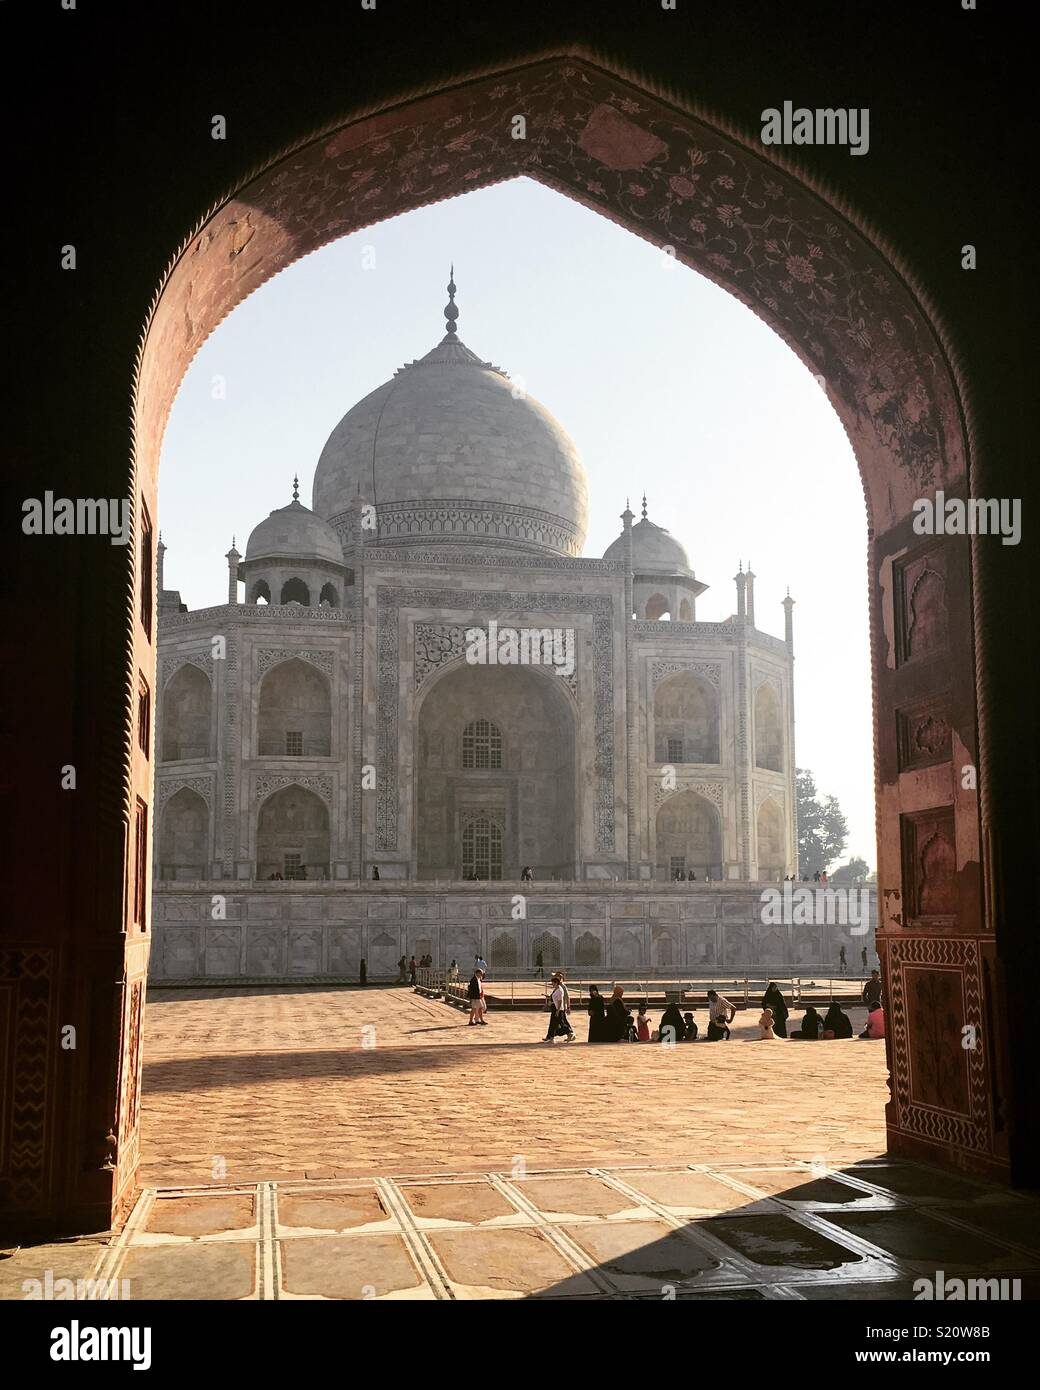 Taj Mahal - Agra, India Immagini Stock